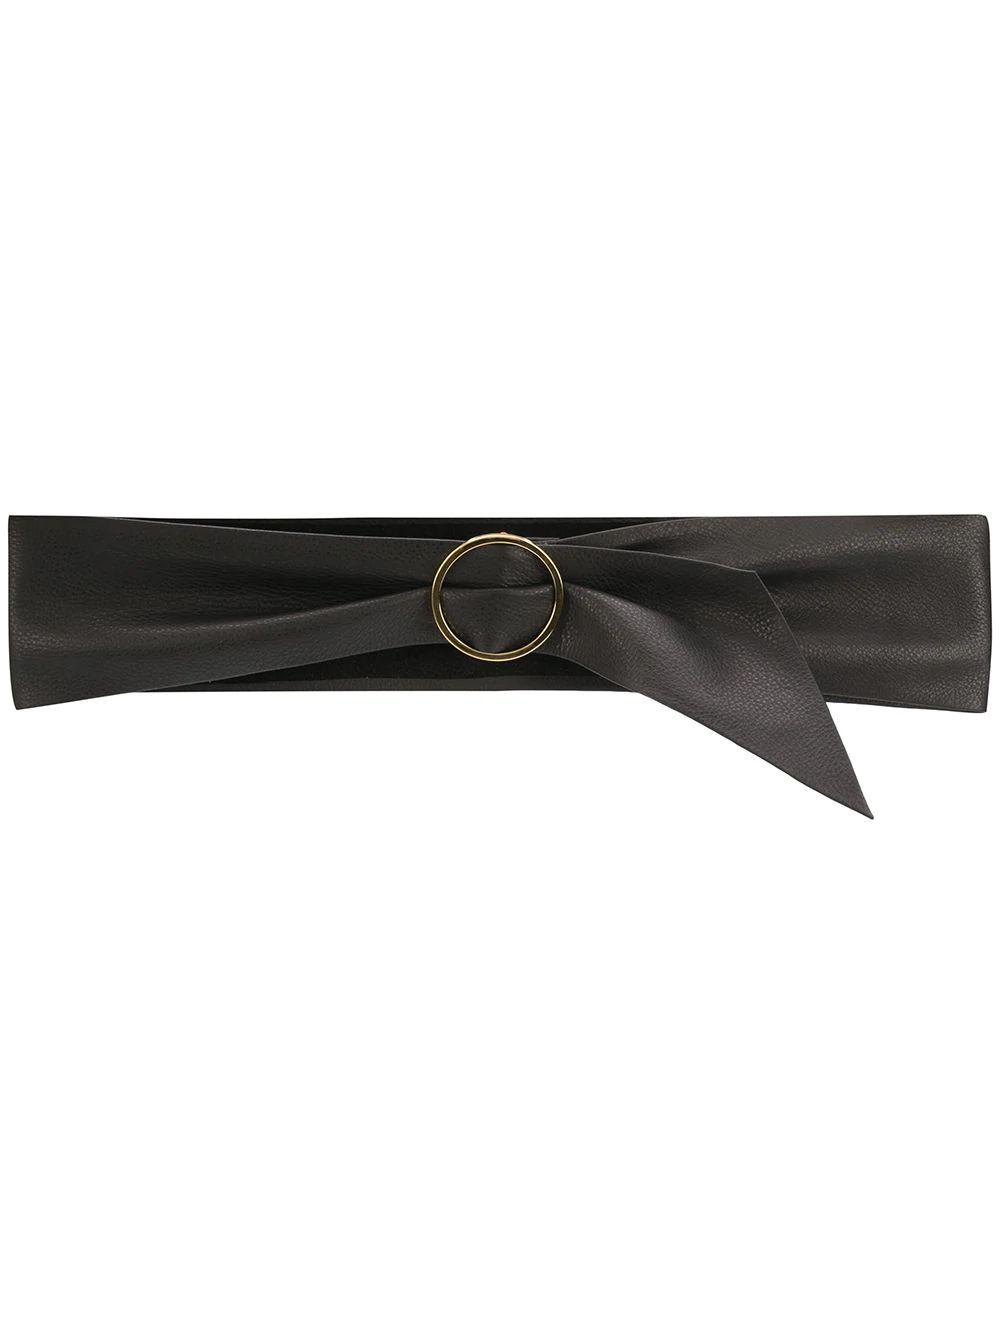 Trisha Wrap Belt